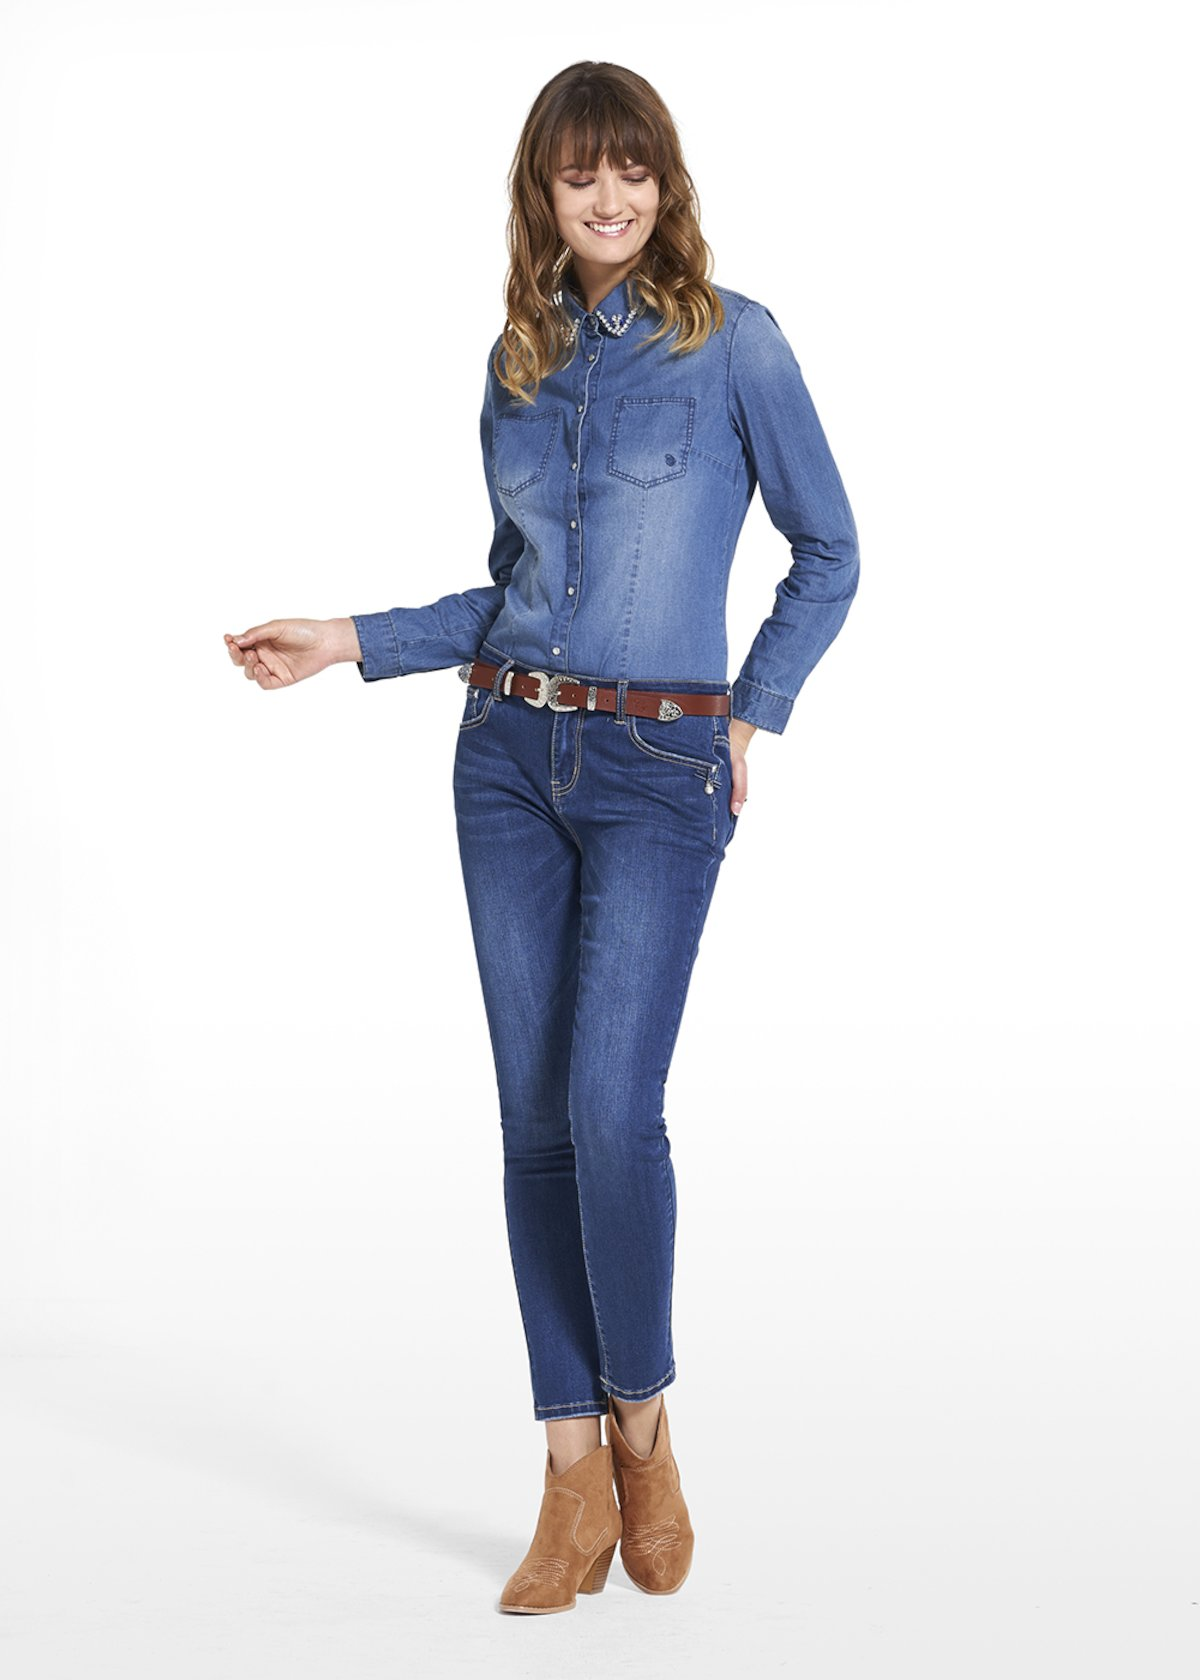 Pantaloni Daniel 5 tasche a gamba skinny con dettaglio grosgrain ribbon - Dark Denim - Donna